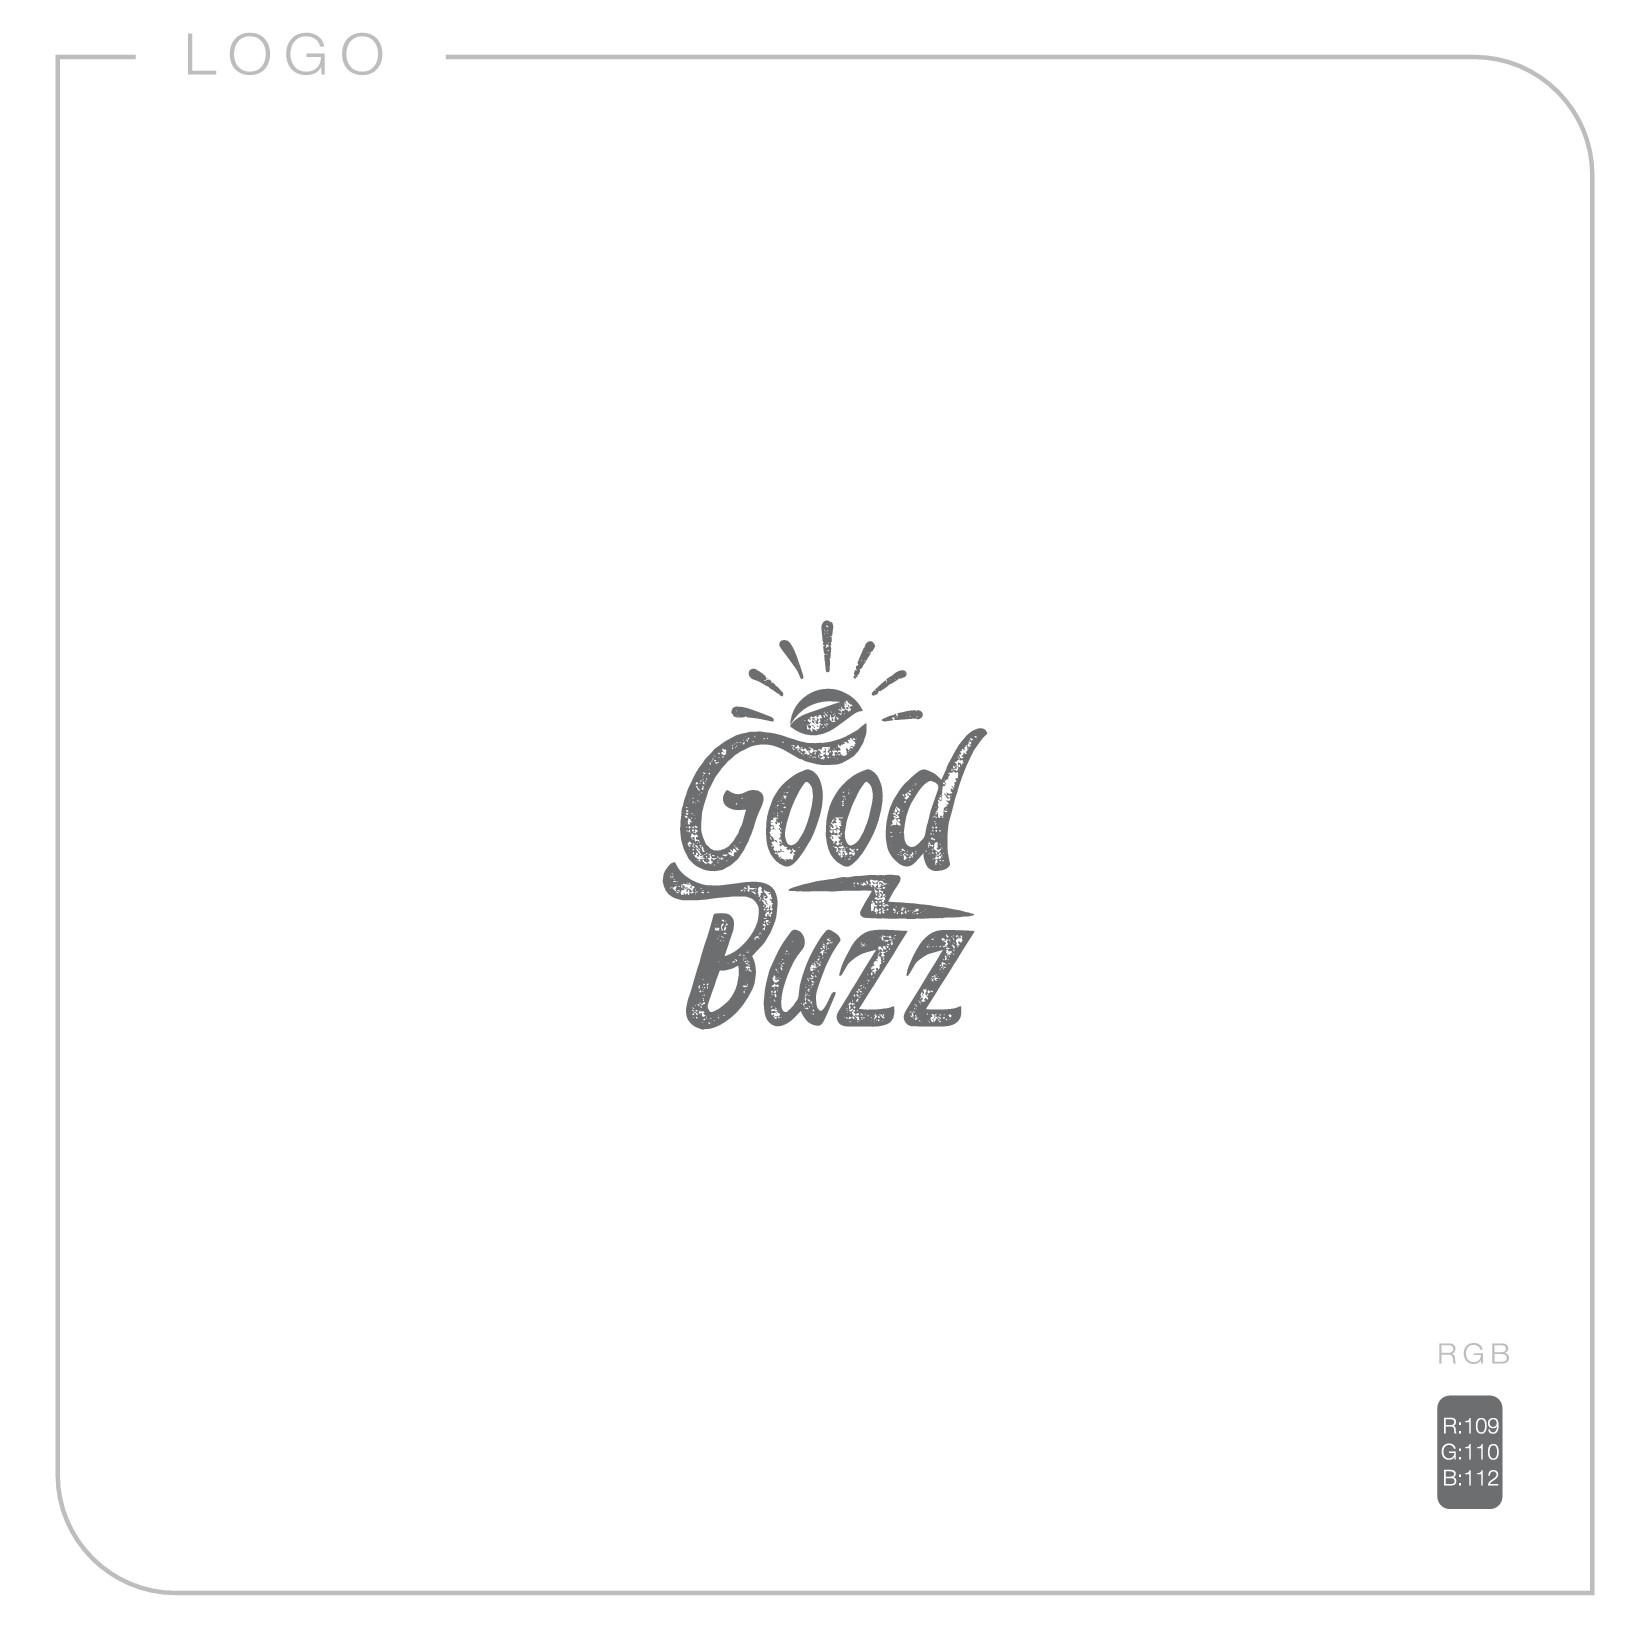 Bring a fresh BUZZ to our kombucha brand - GoodBuzz